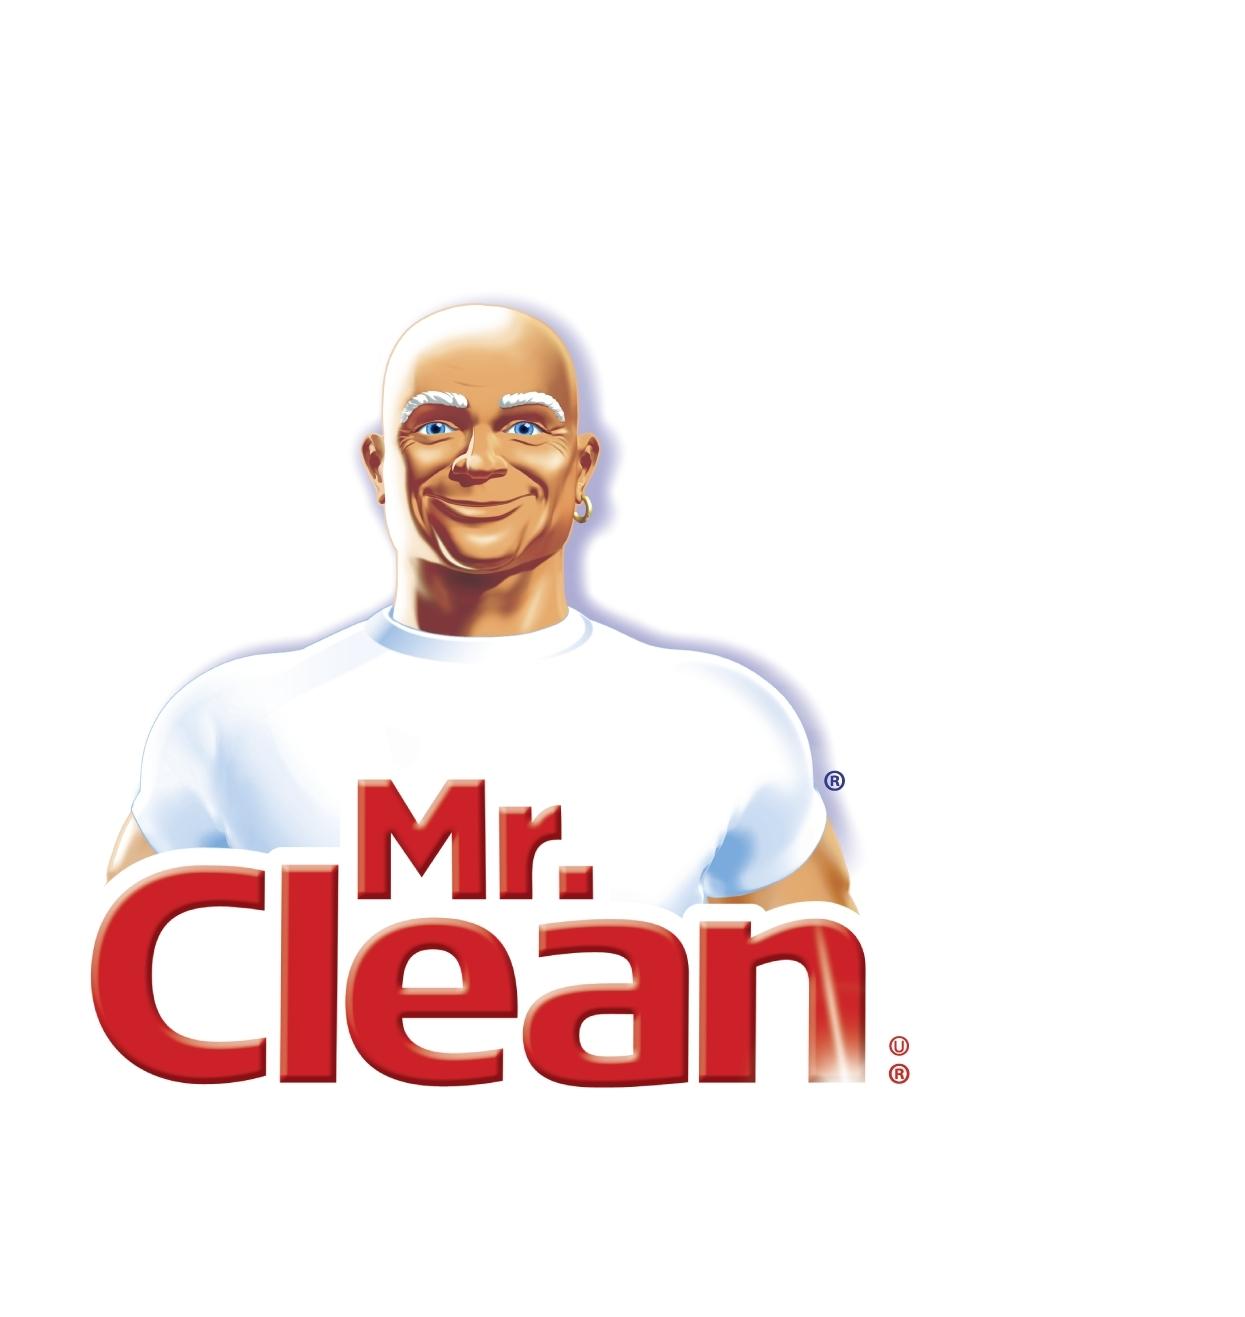 Mr clean Logos.